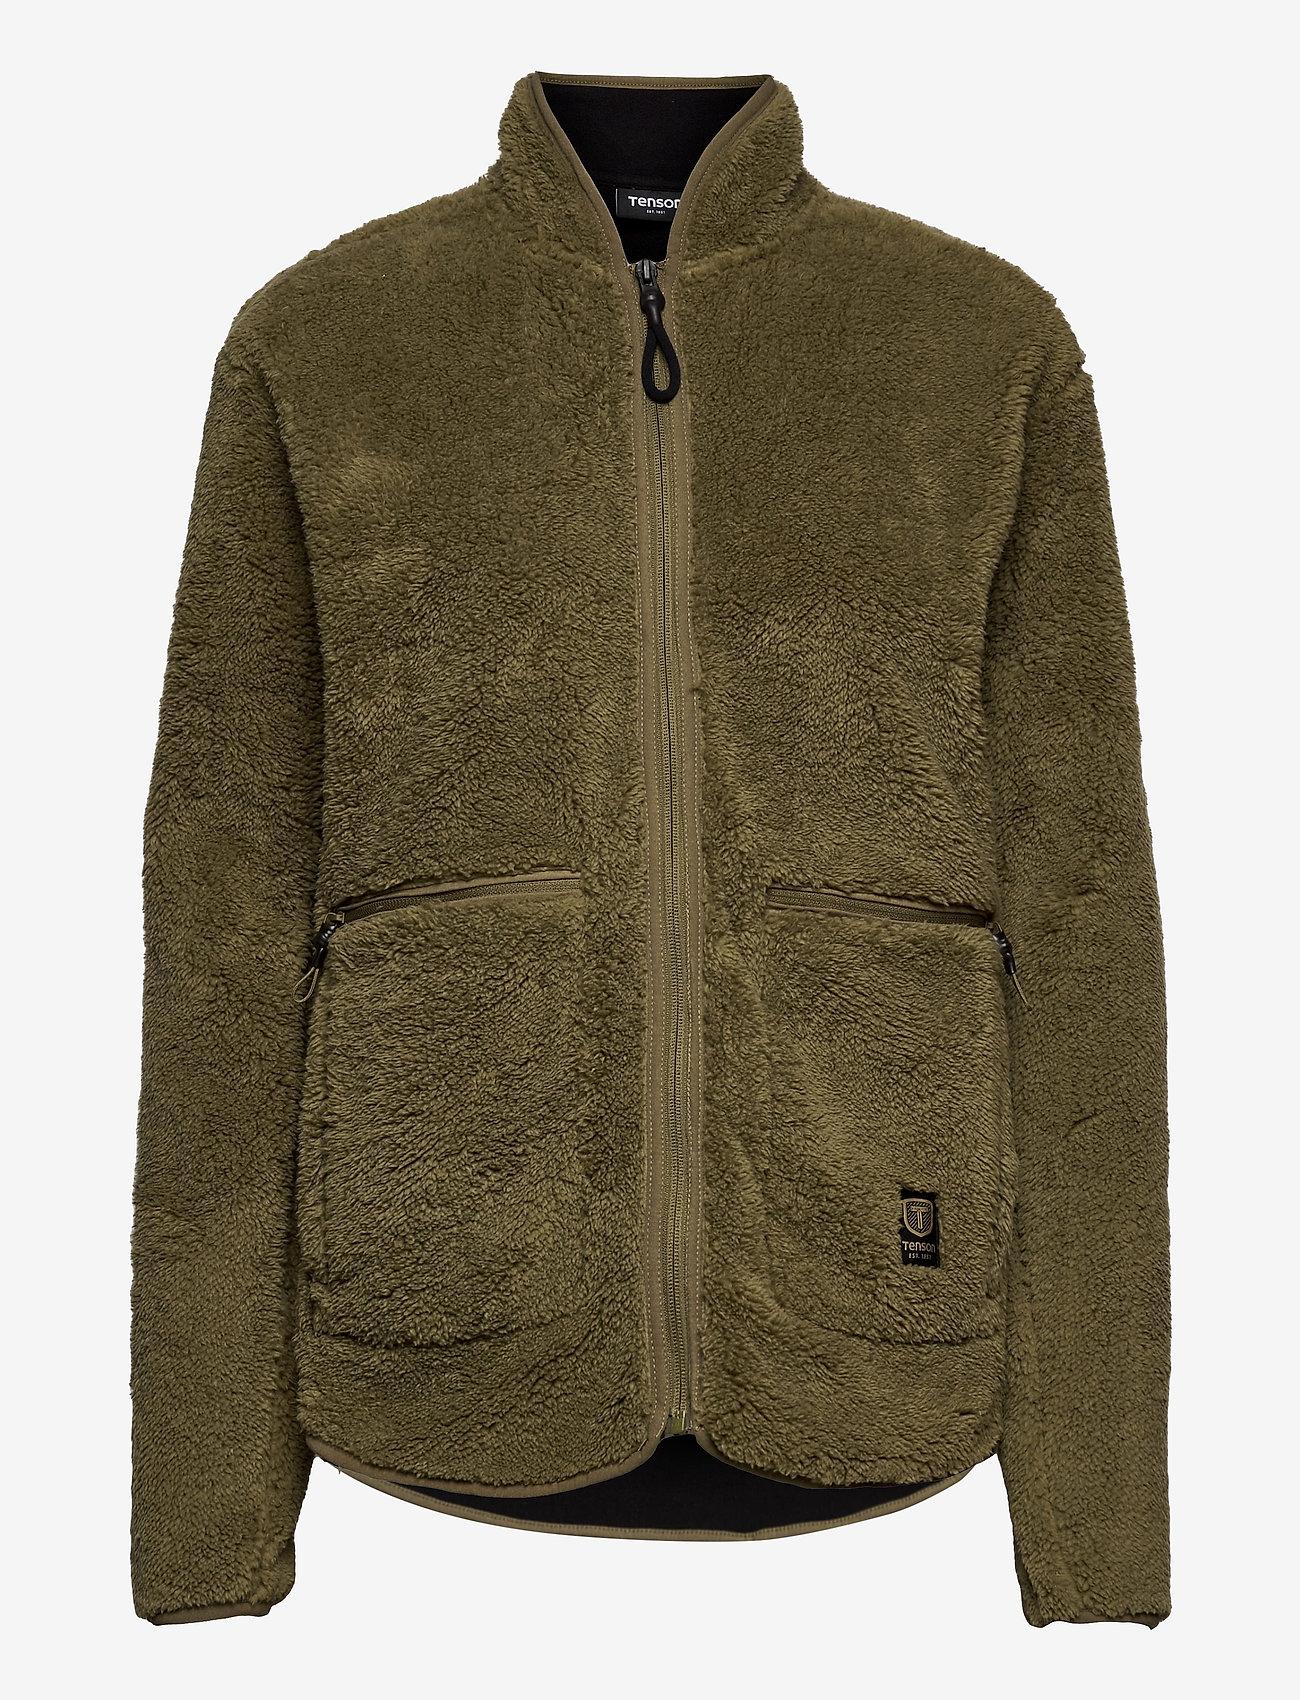 Tenson - Nechako Pile Jkt M - basic-sweatshirts - olive - 0